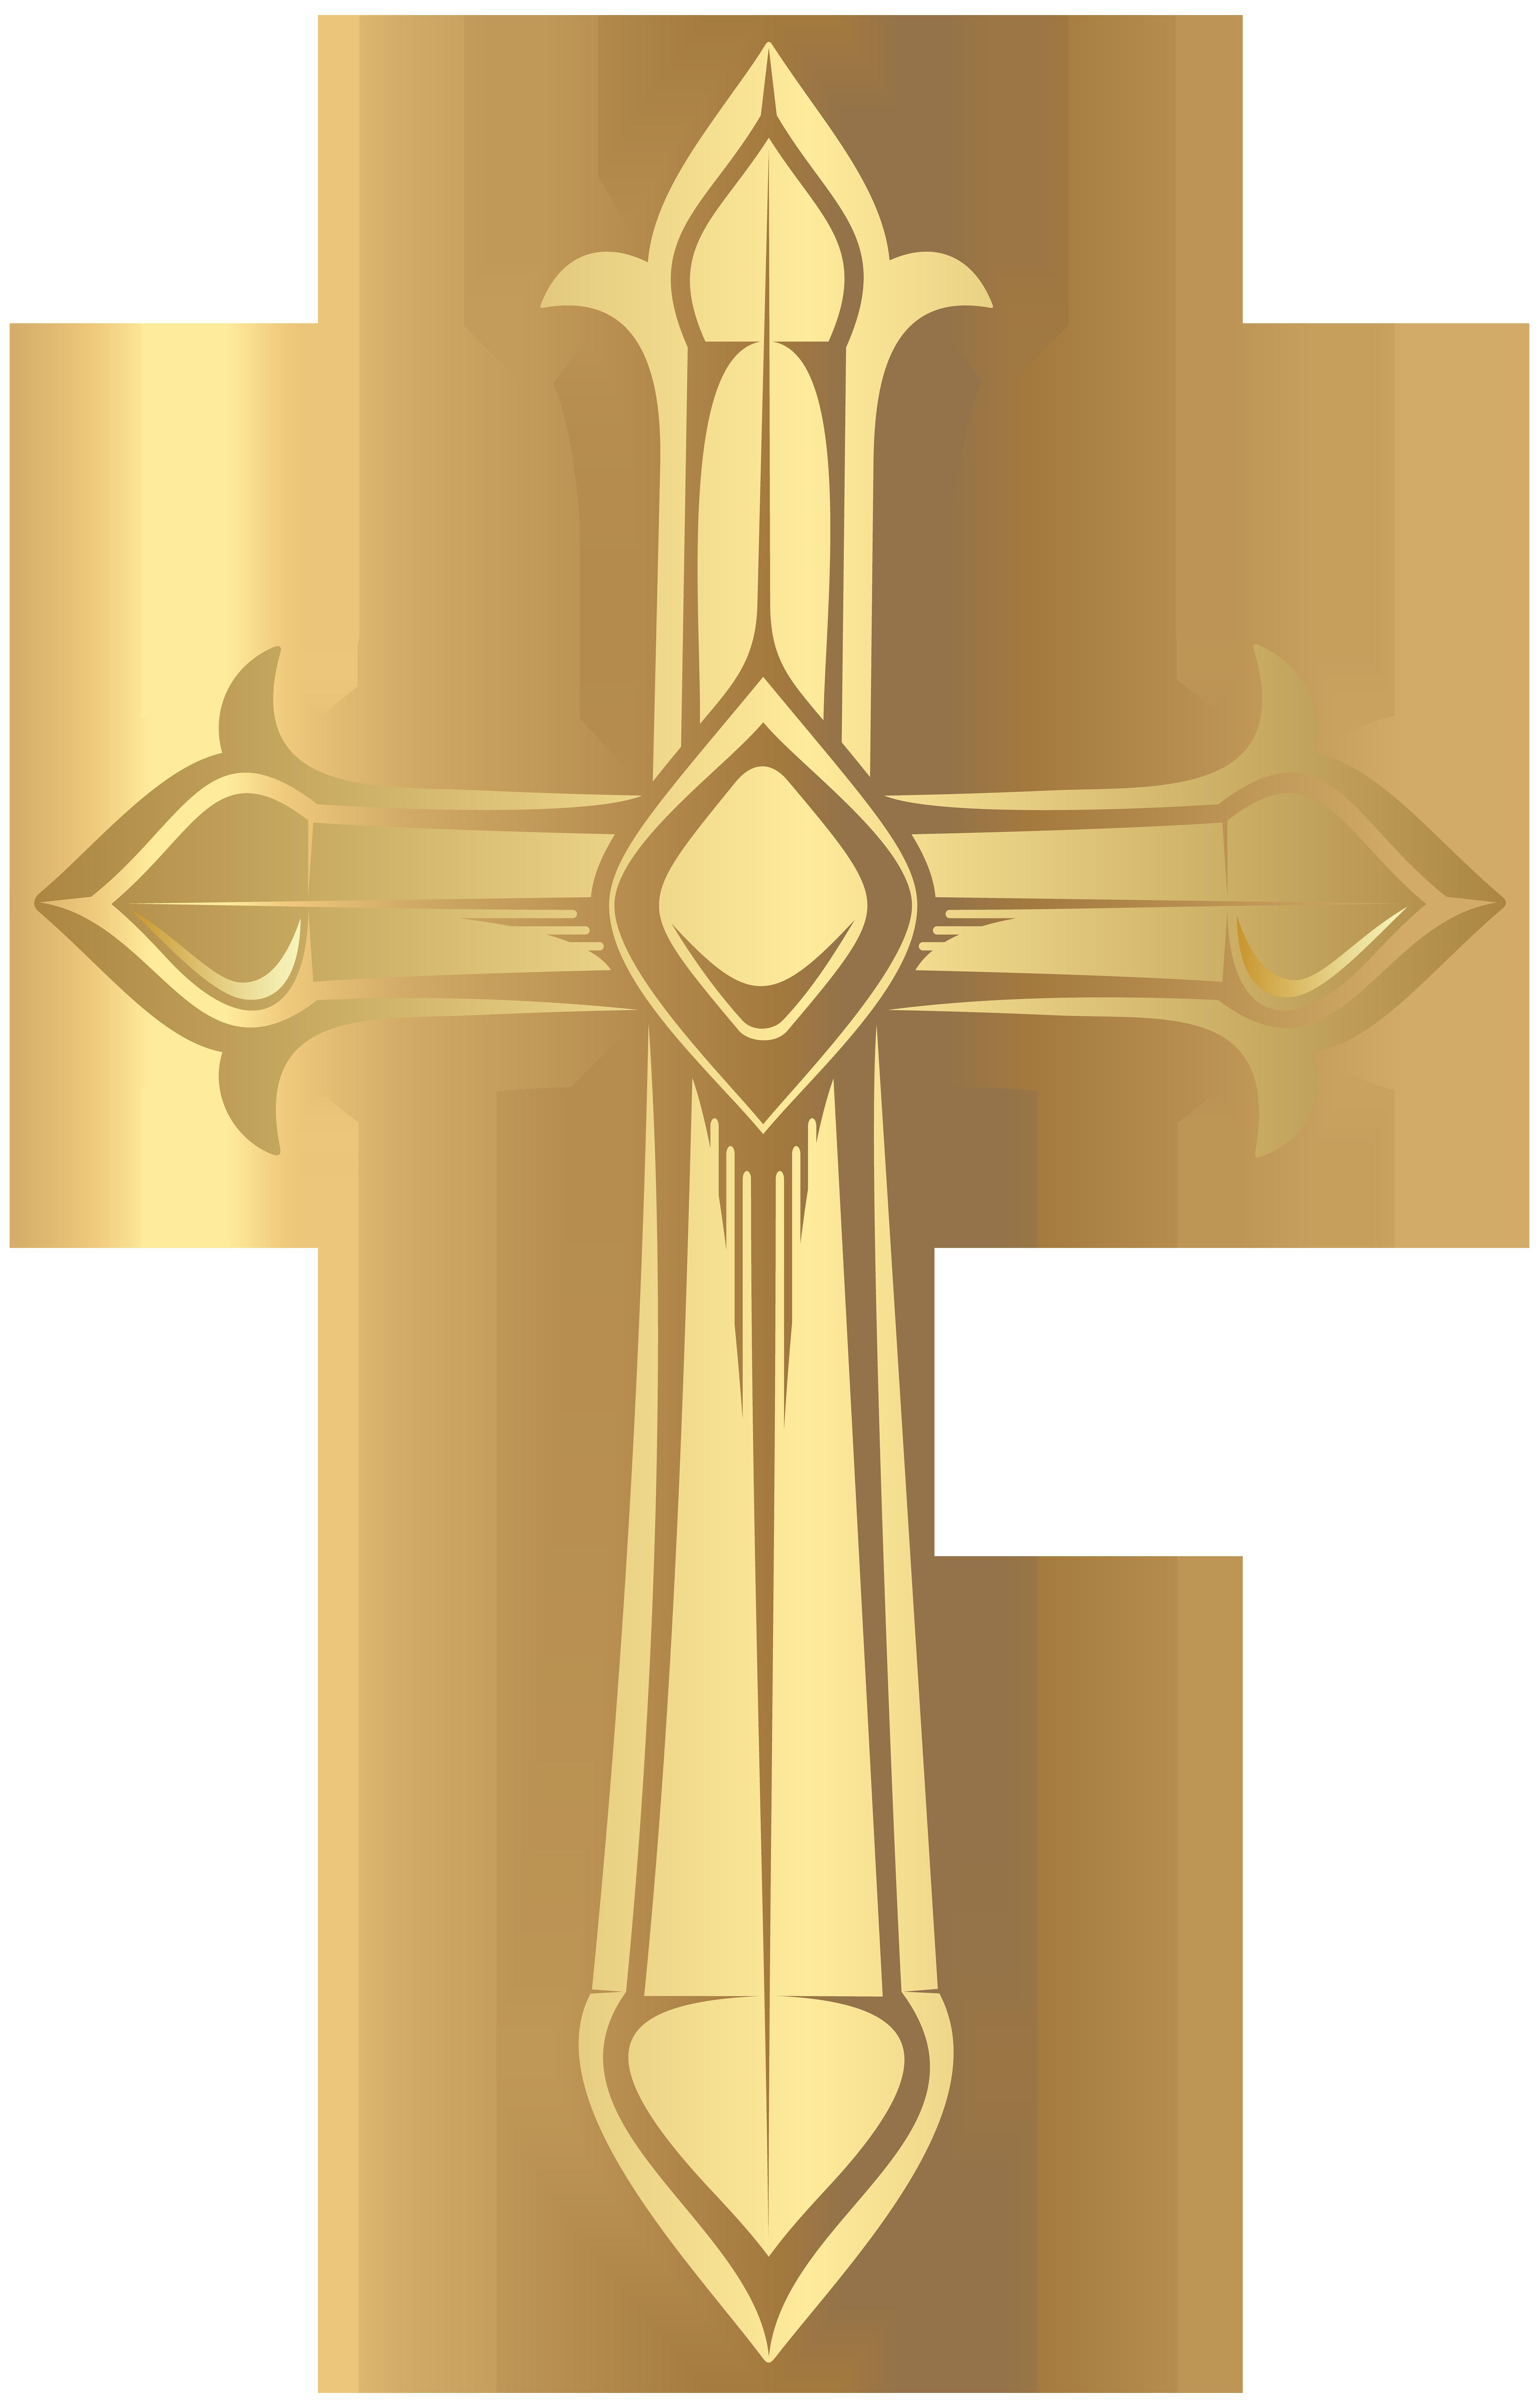 18+ Roman catholic cross clipart ideas in 2021